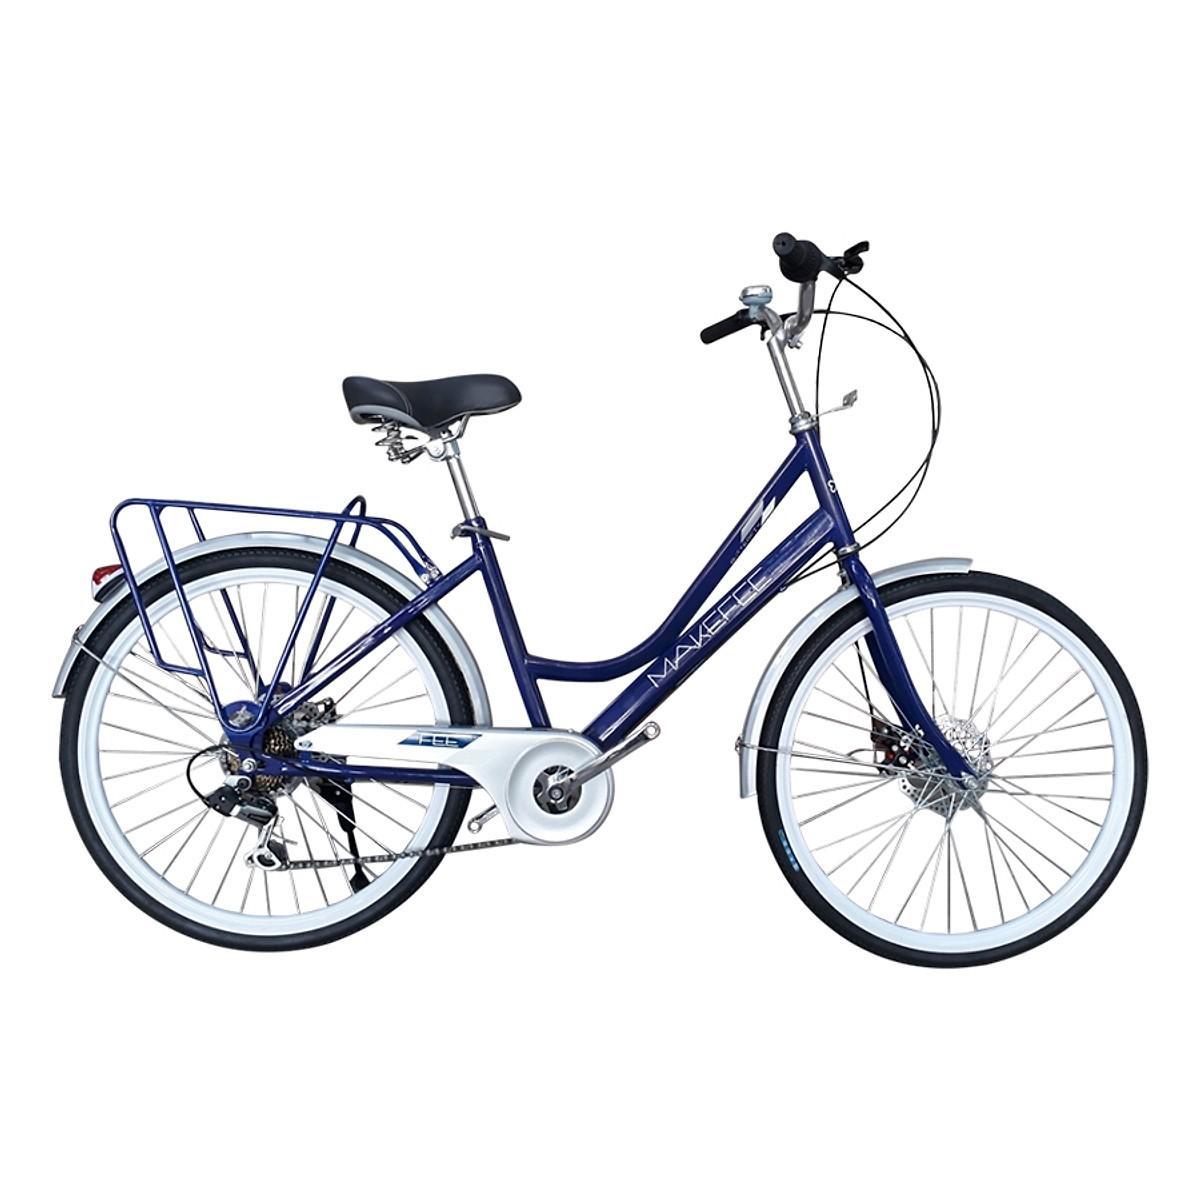 Xe đạp thời trang Makefee Butterfly 24 Blue White